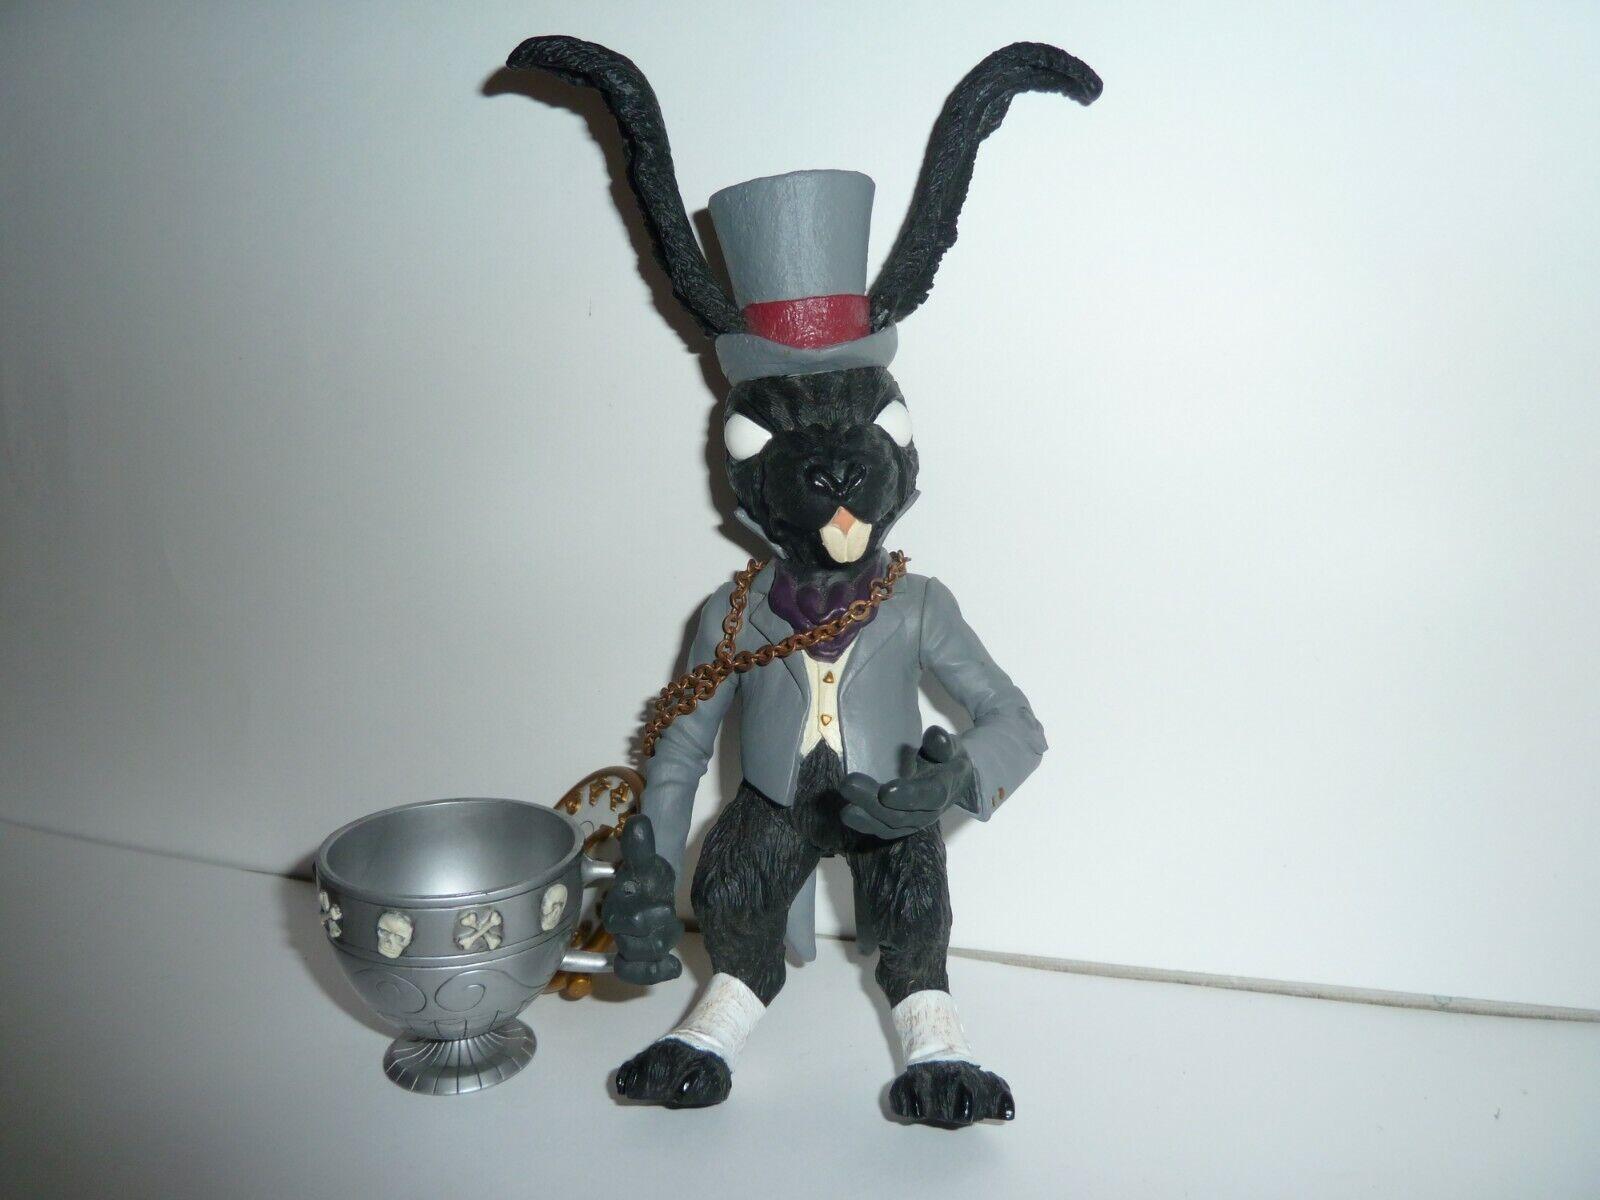 American McGee's Alice in wonderland madness returns Weiß rabbit statue figure